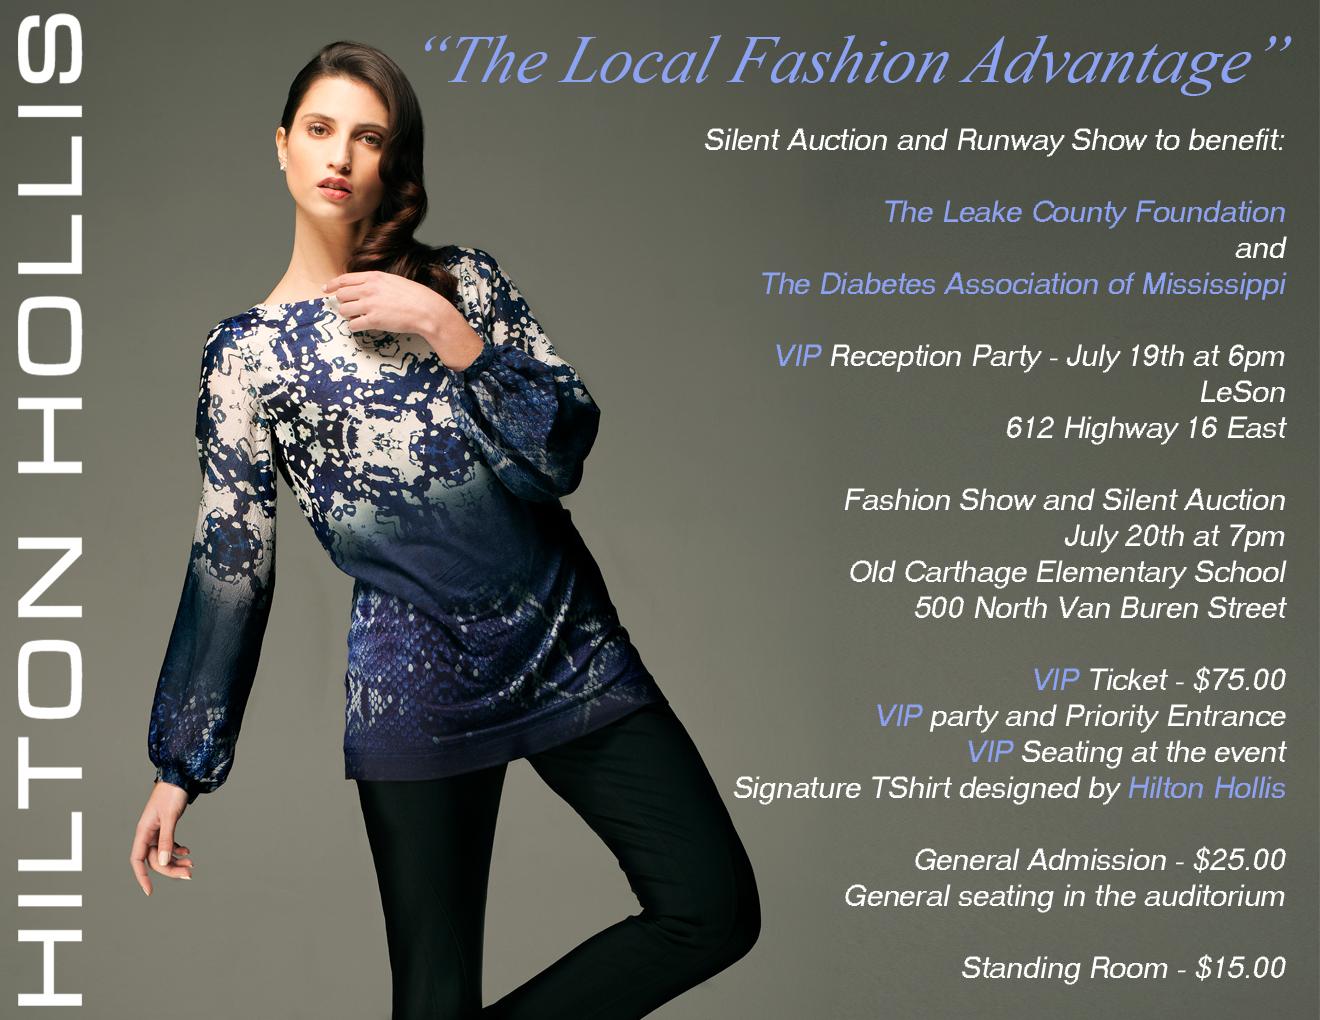 The Local Fashion Advantage By Renowned Fashion Designer Hilton Hollis